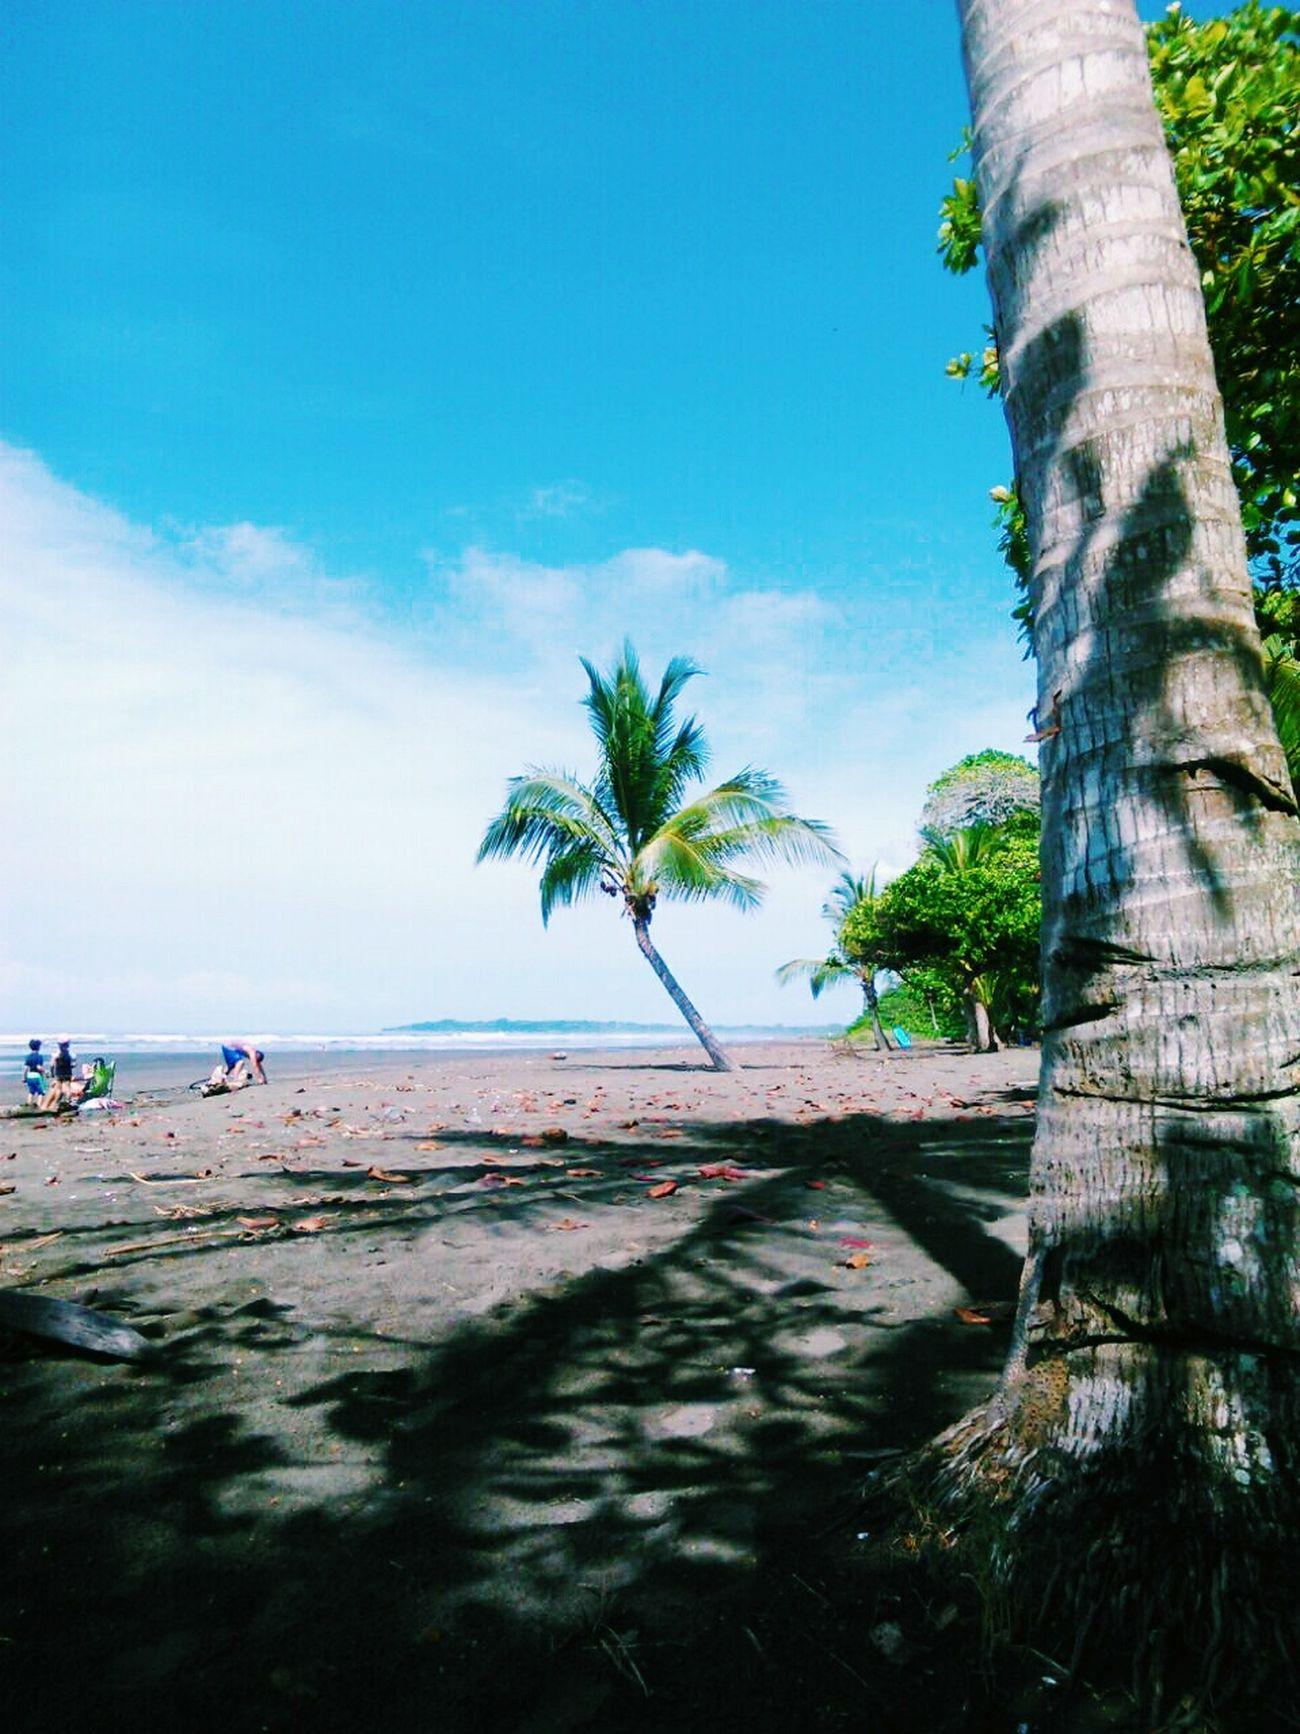 Costa Rica Pura Vida ✌ Nature Cloud - Sky Majestic Water Relaxing Green Color Beach Sun Tropical Climate Palm Tree 🌴